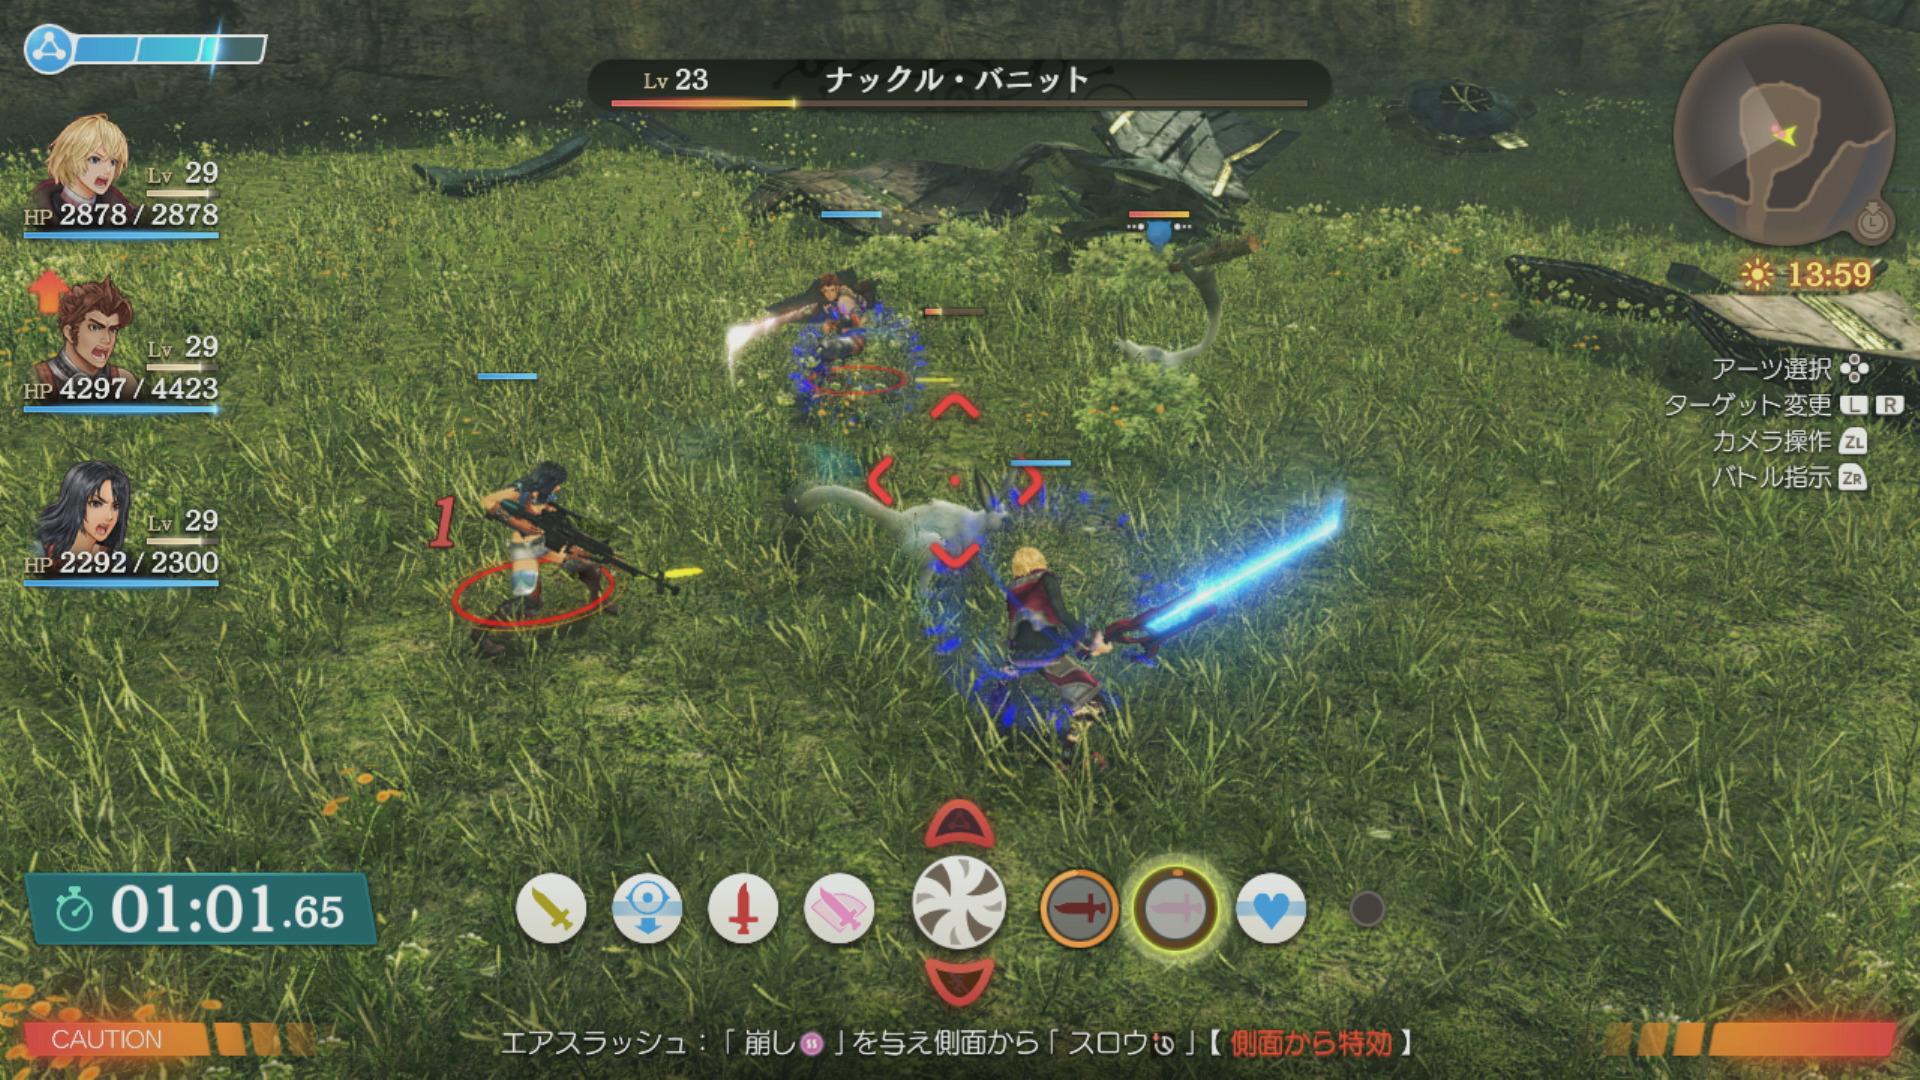 Xenoblade Chronicles: Definitive Edition Time Attack mode